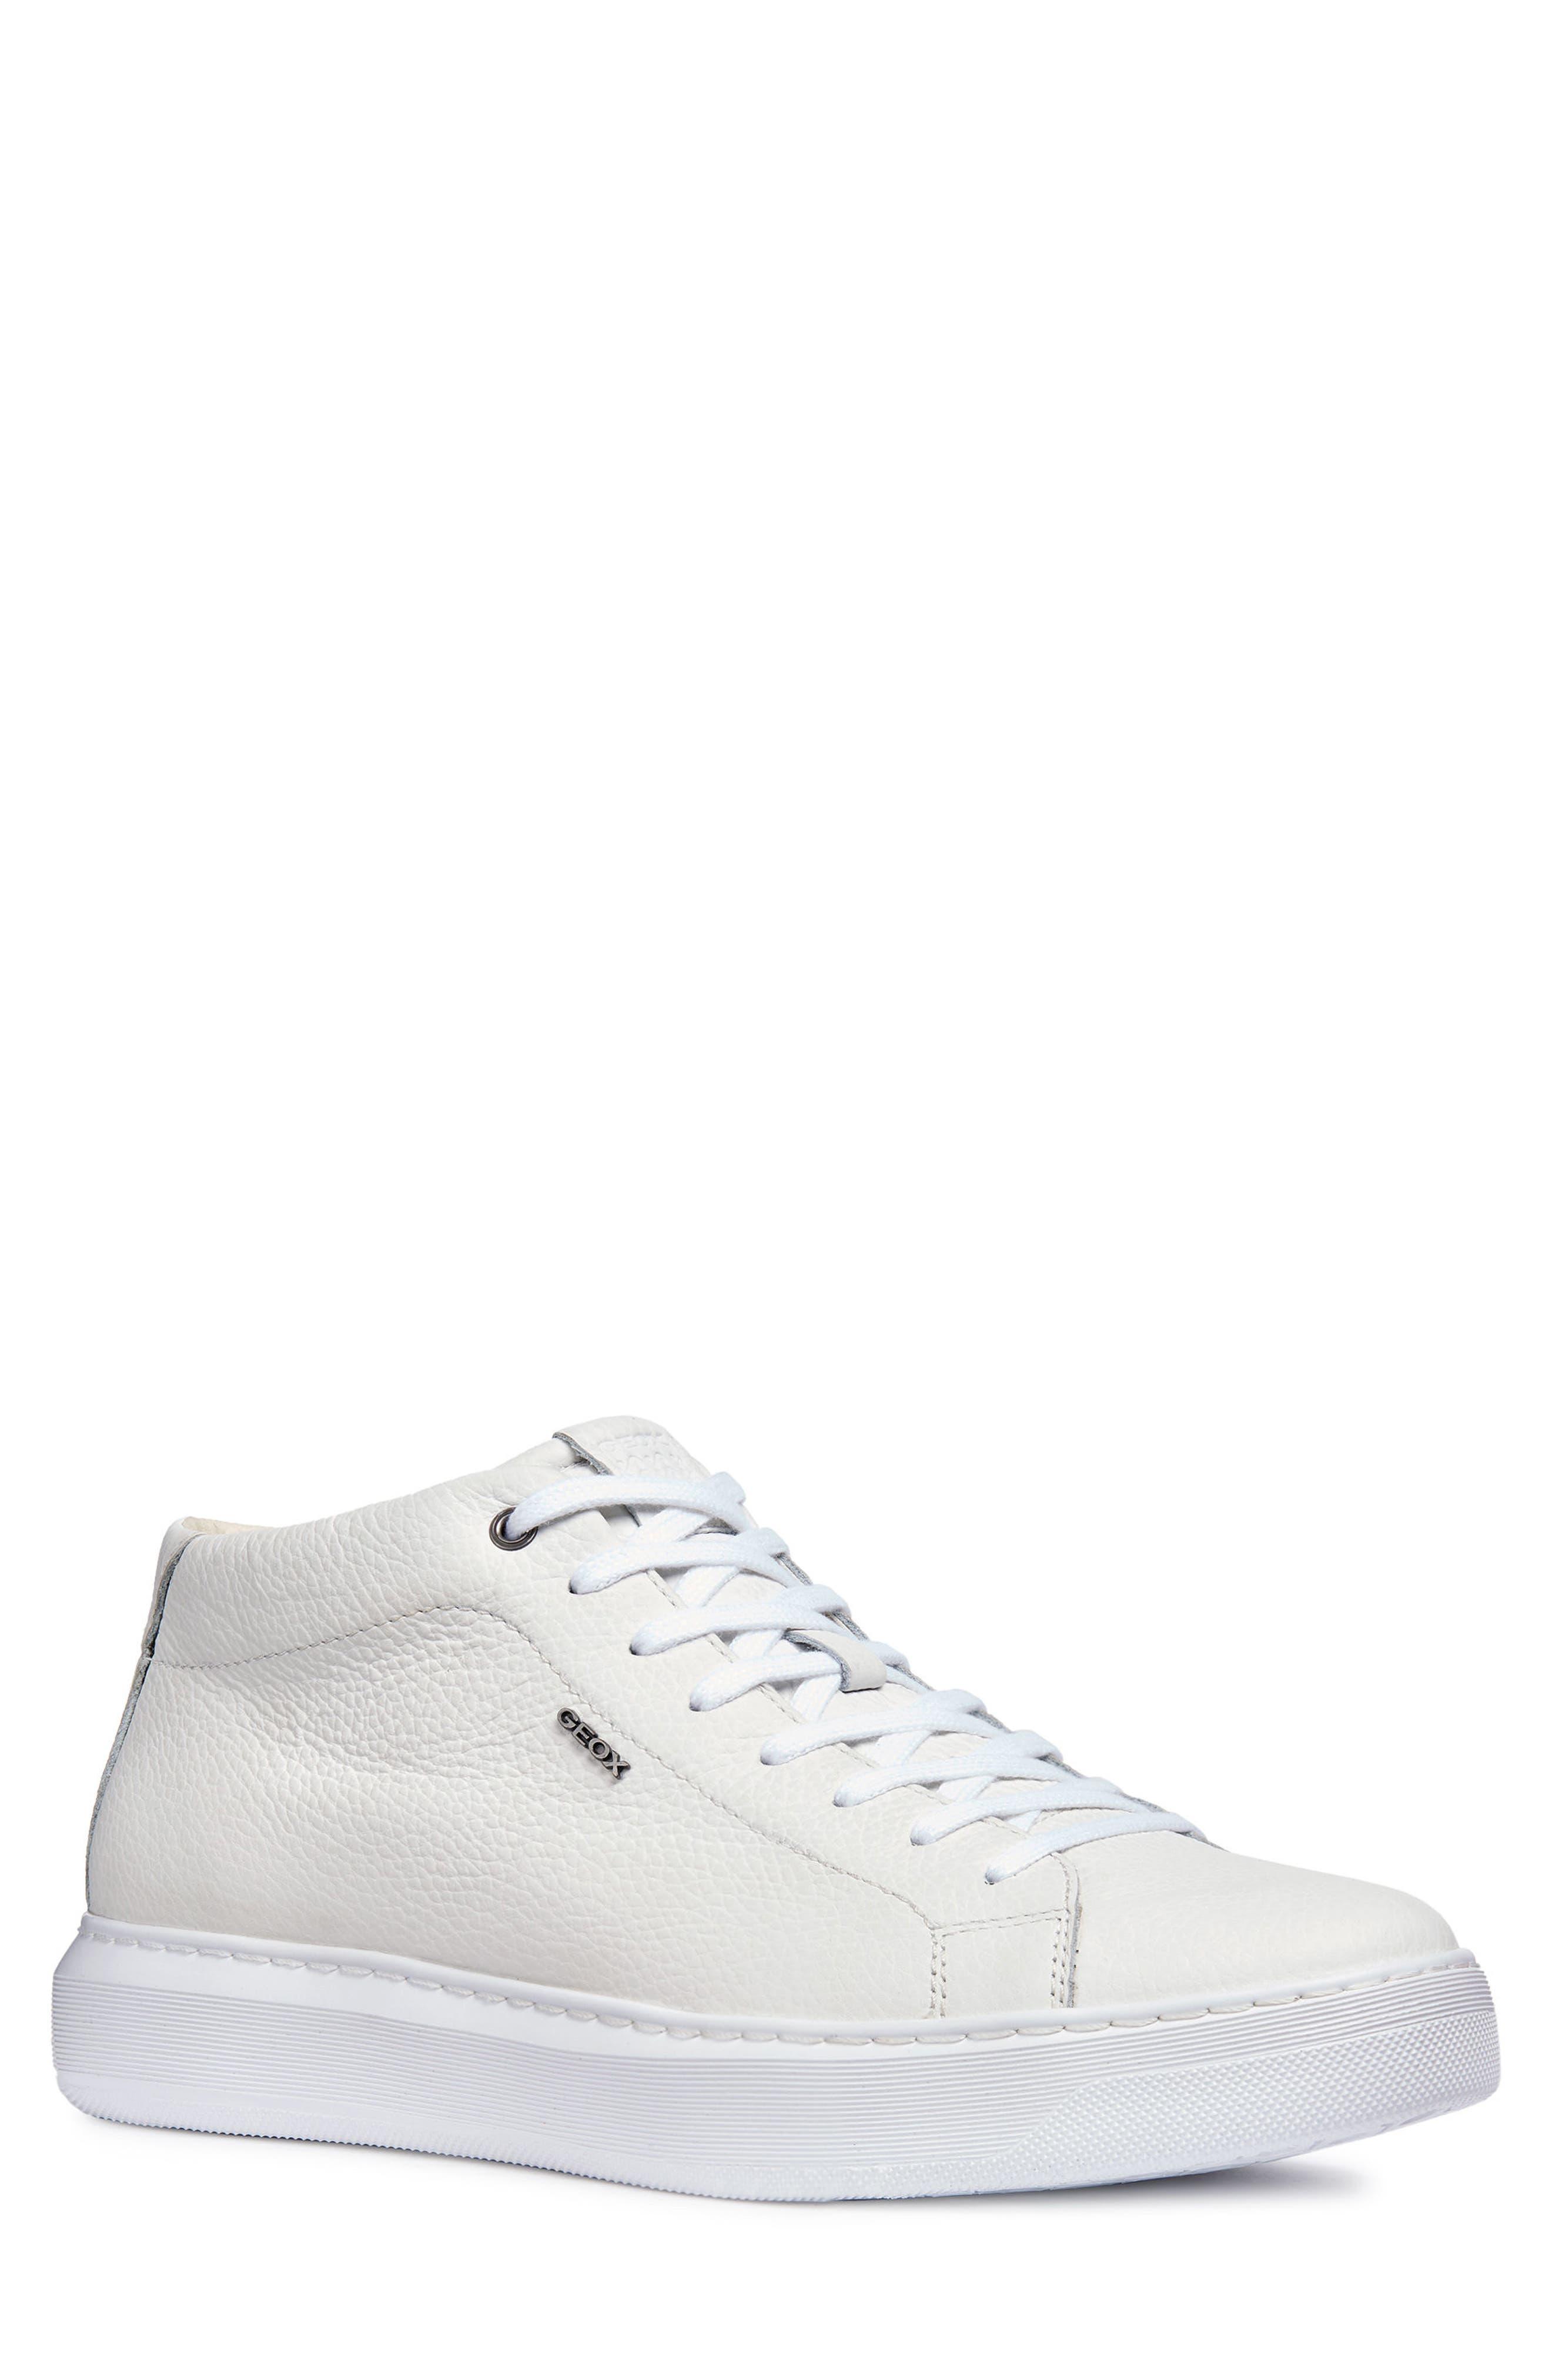 Deiven 3 Mid Top Sneaker, Main, color, 100